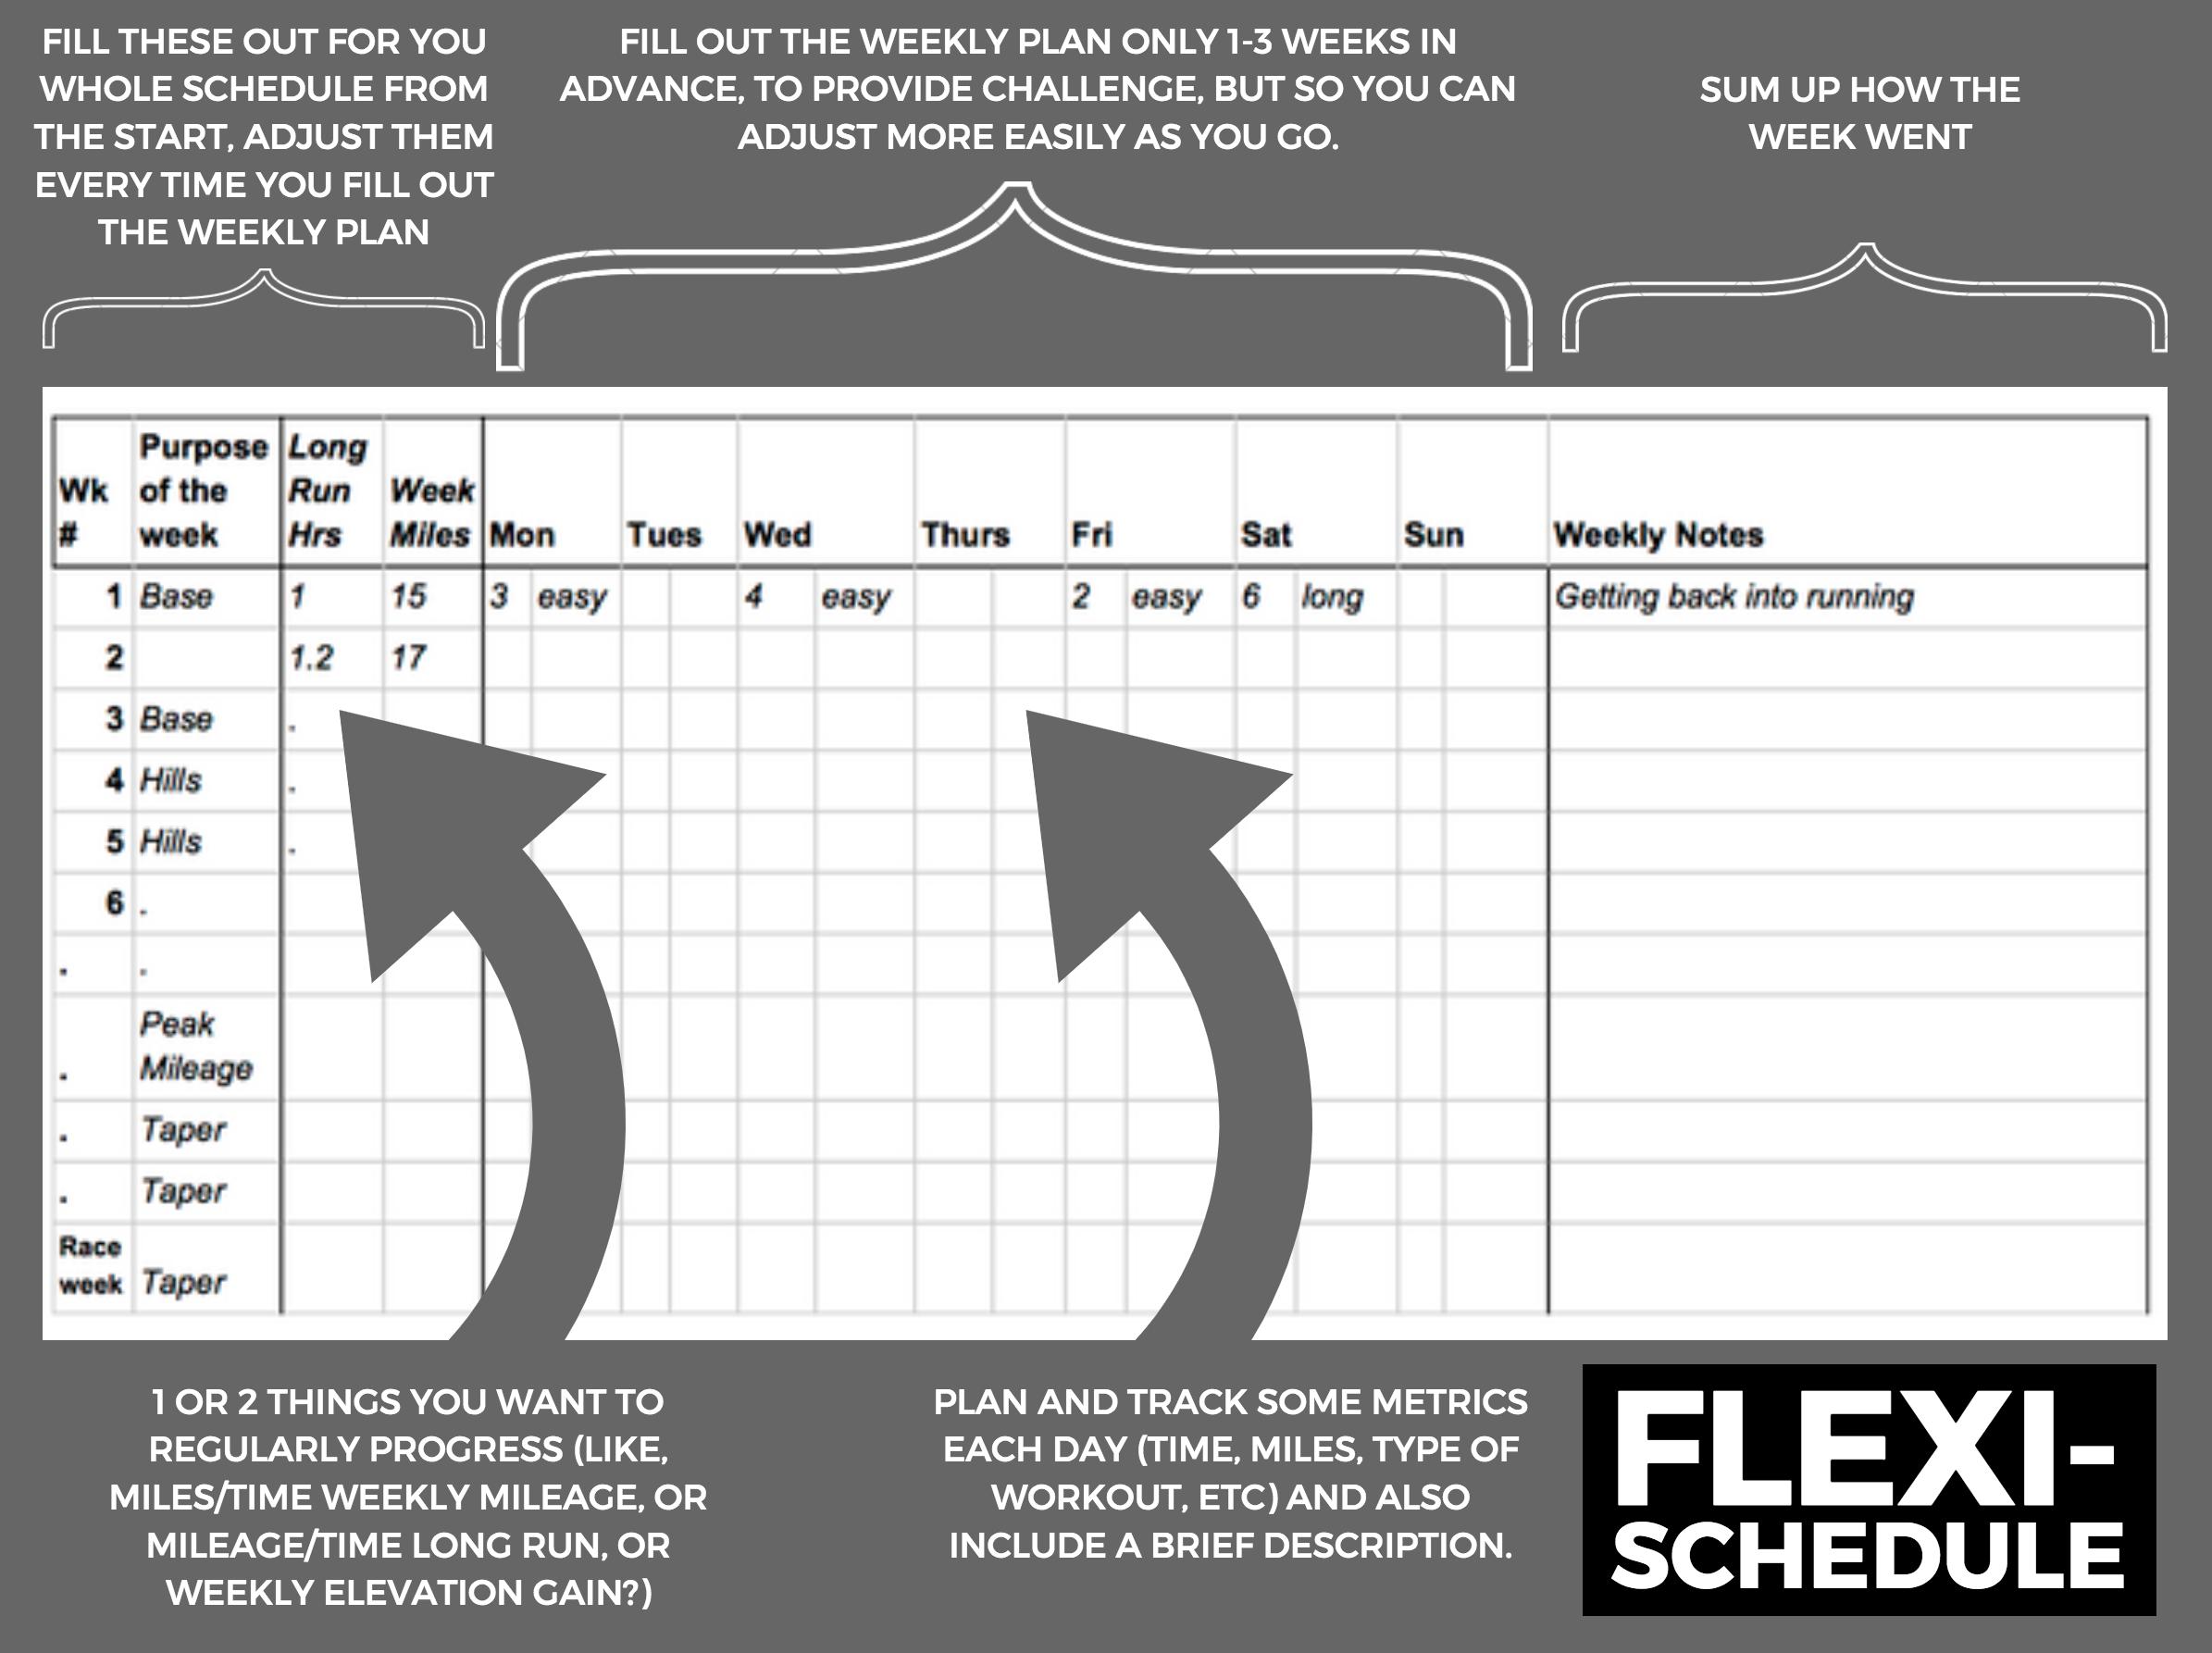 Flexi-schedule instructions.png